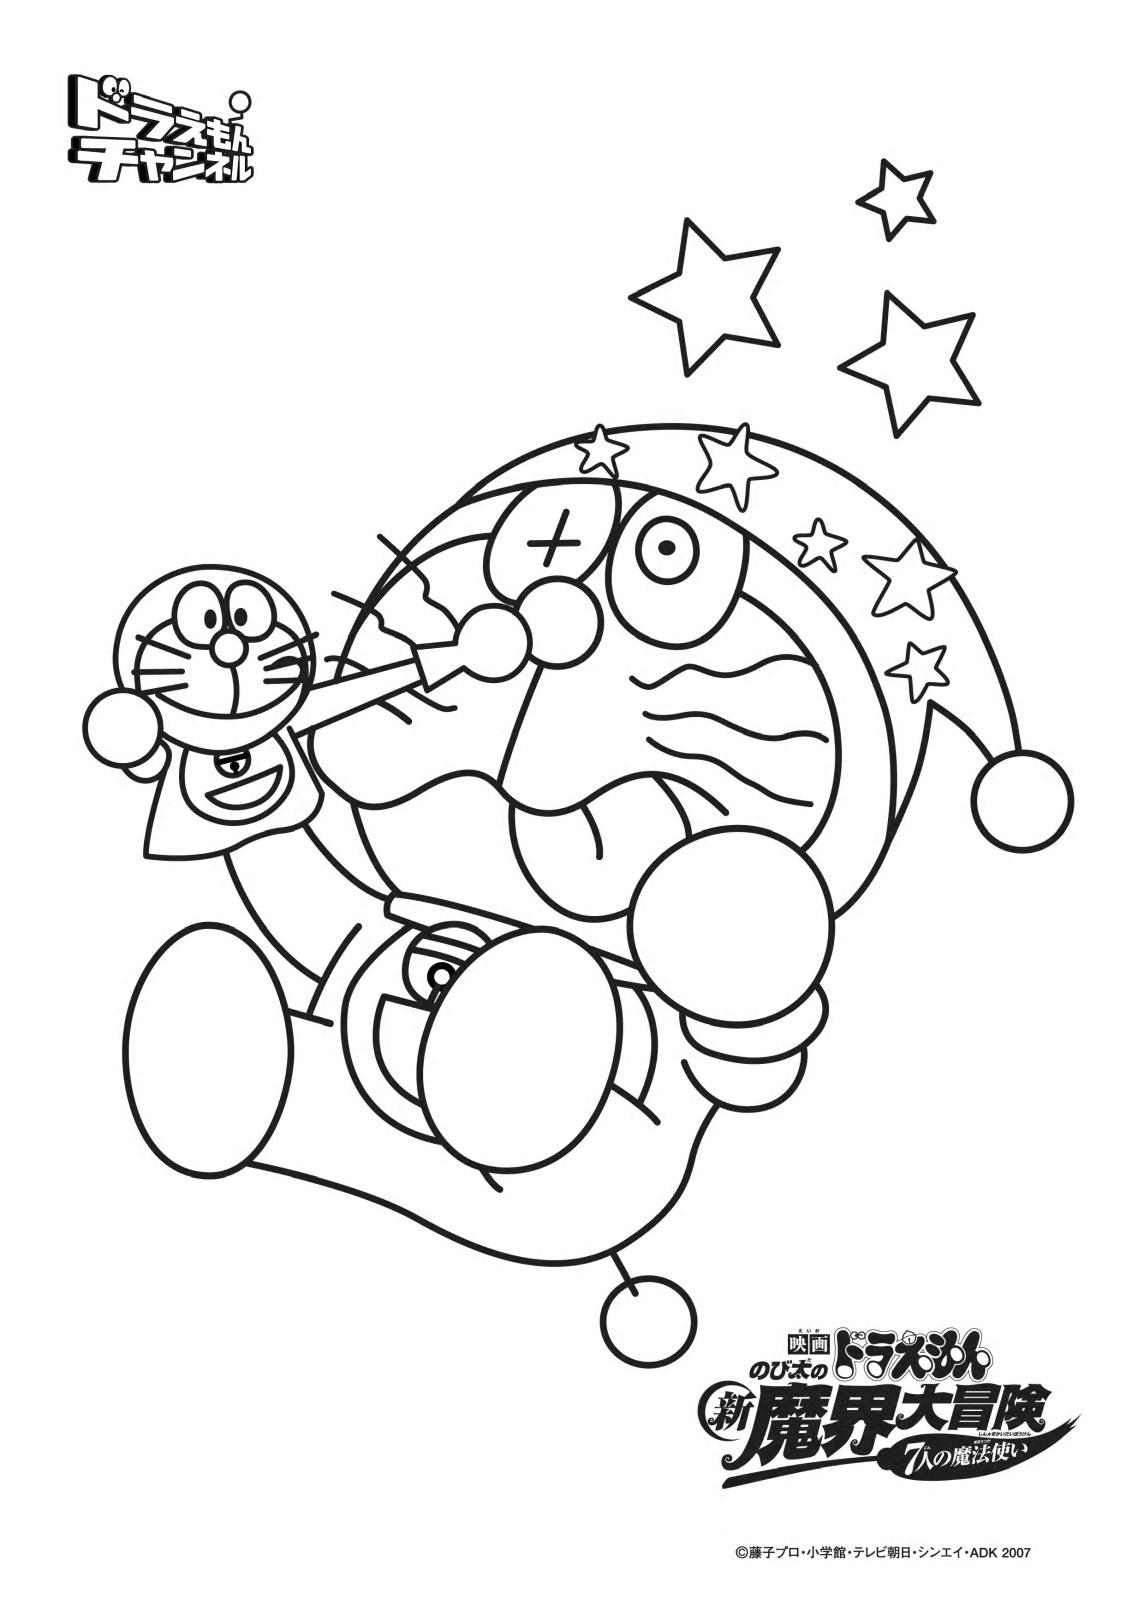 Coloring Book - Doraemon